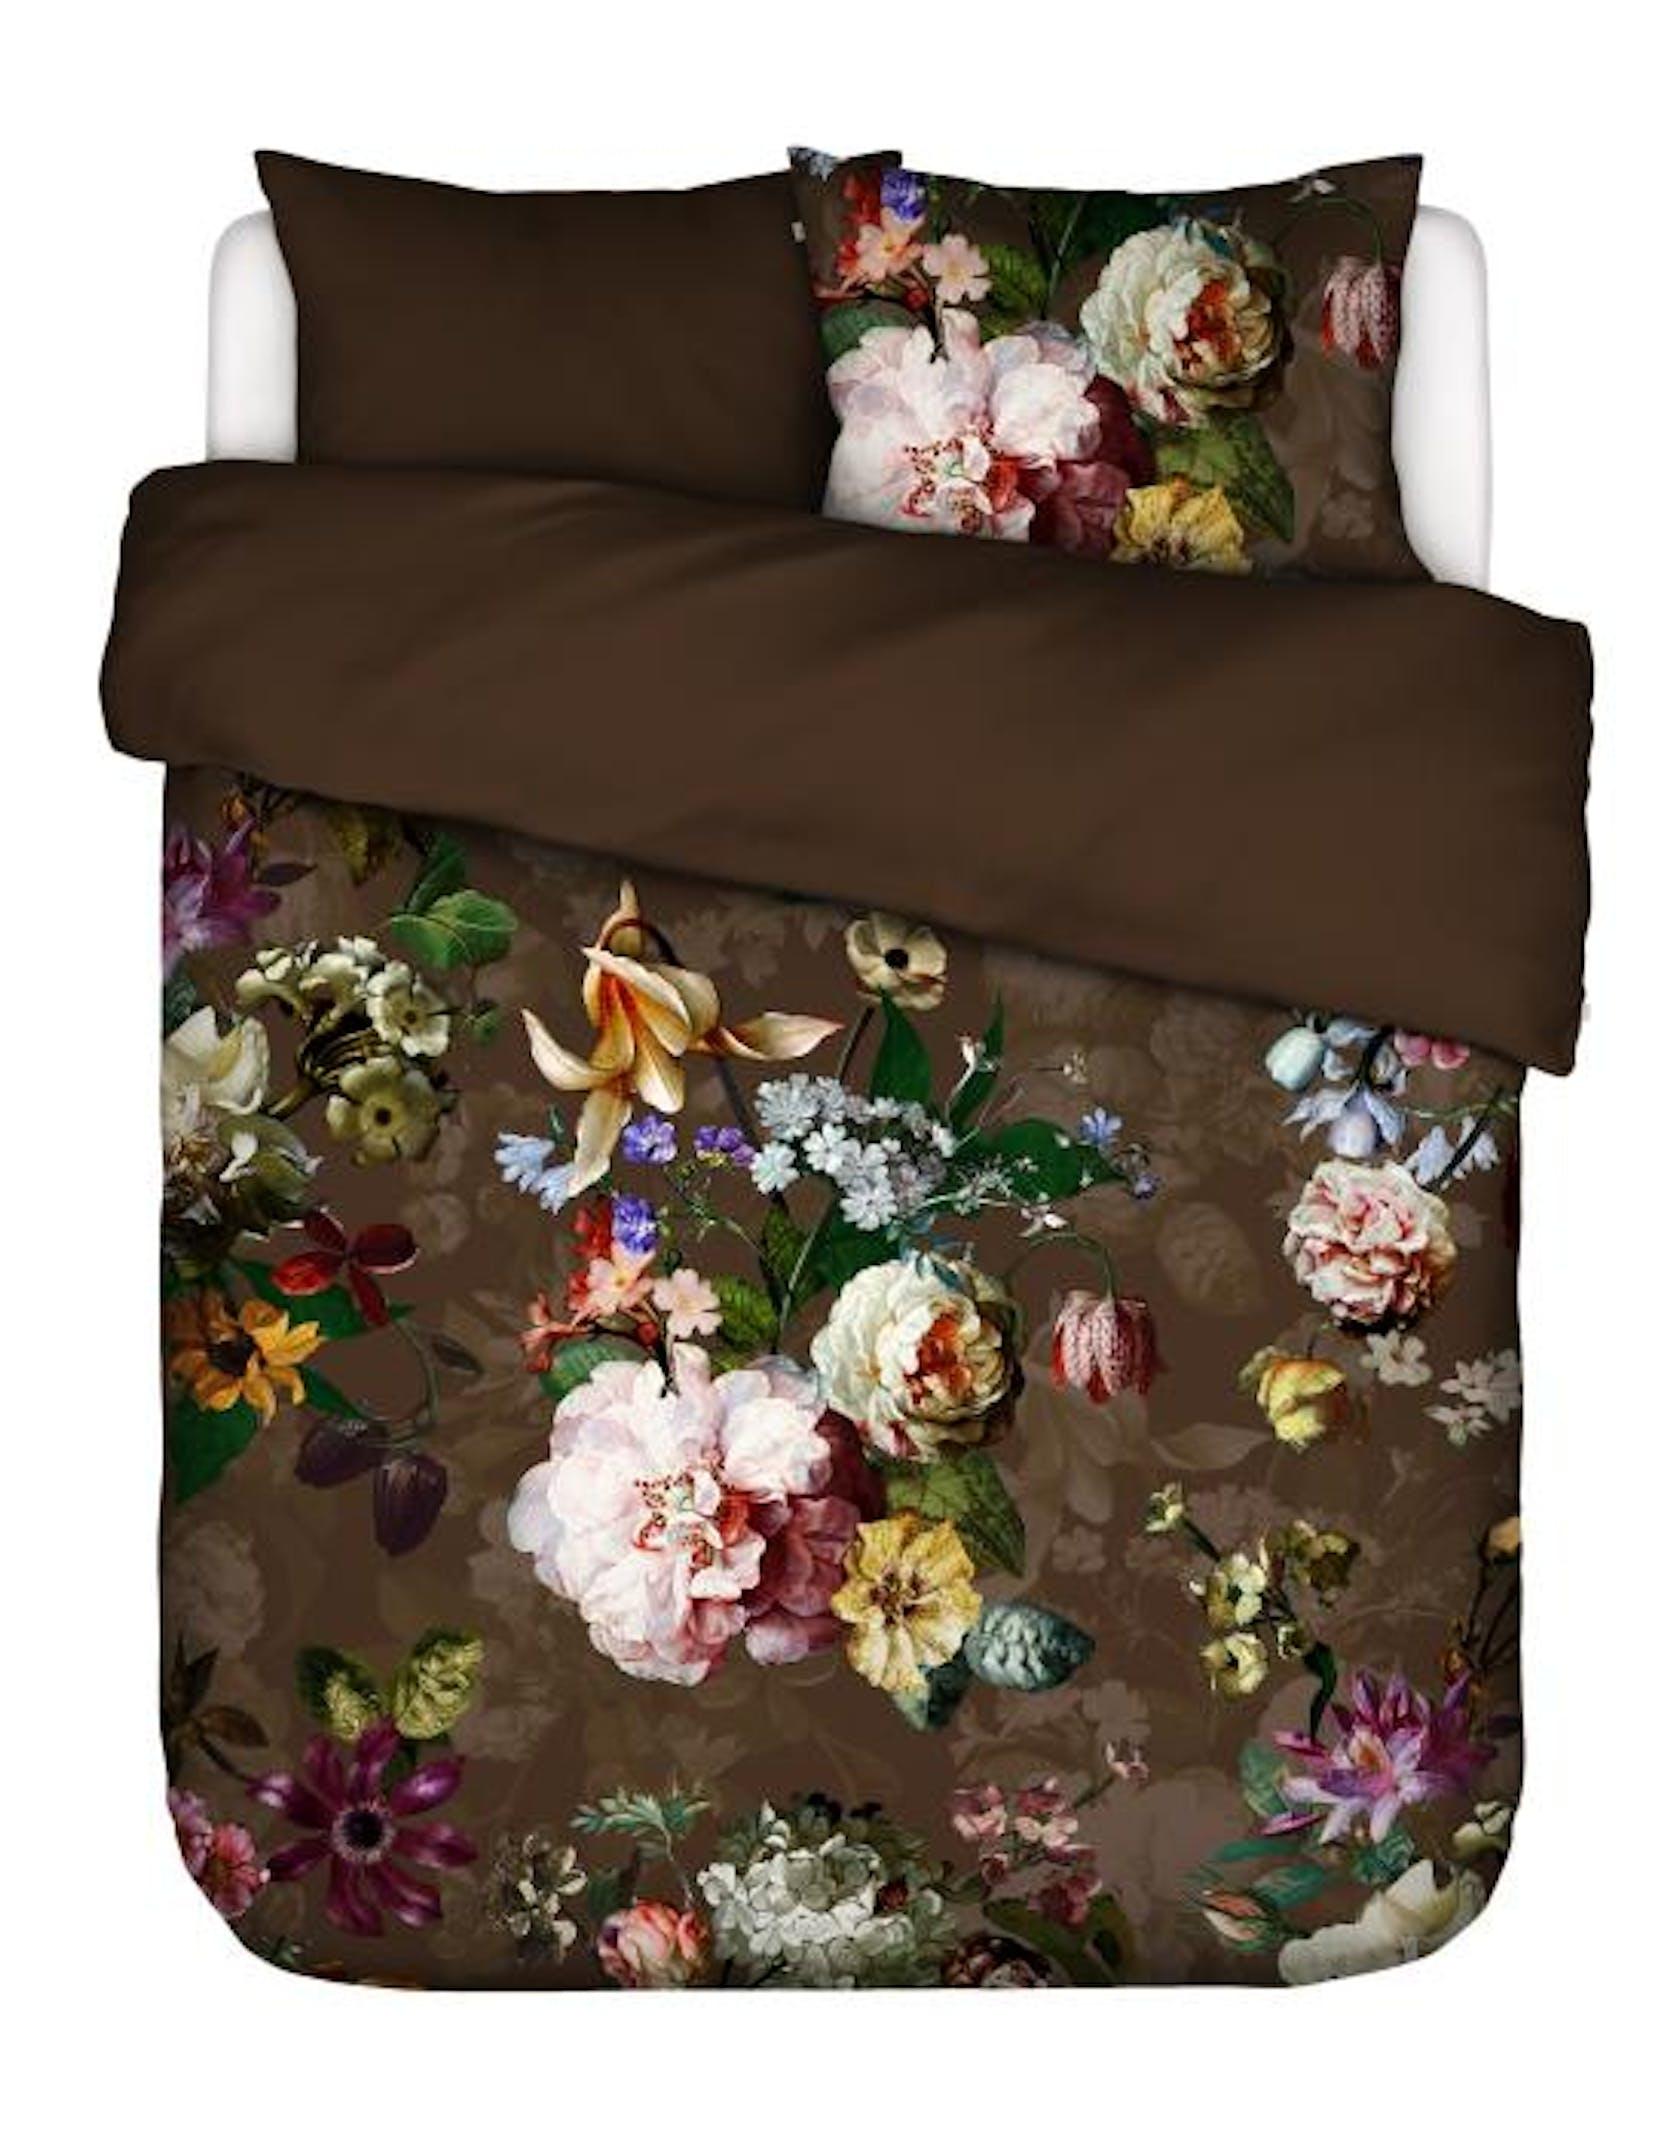 ESSENZA Fleur Chocolate Duvet cover